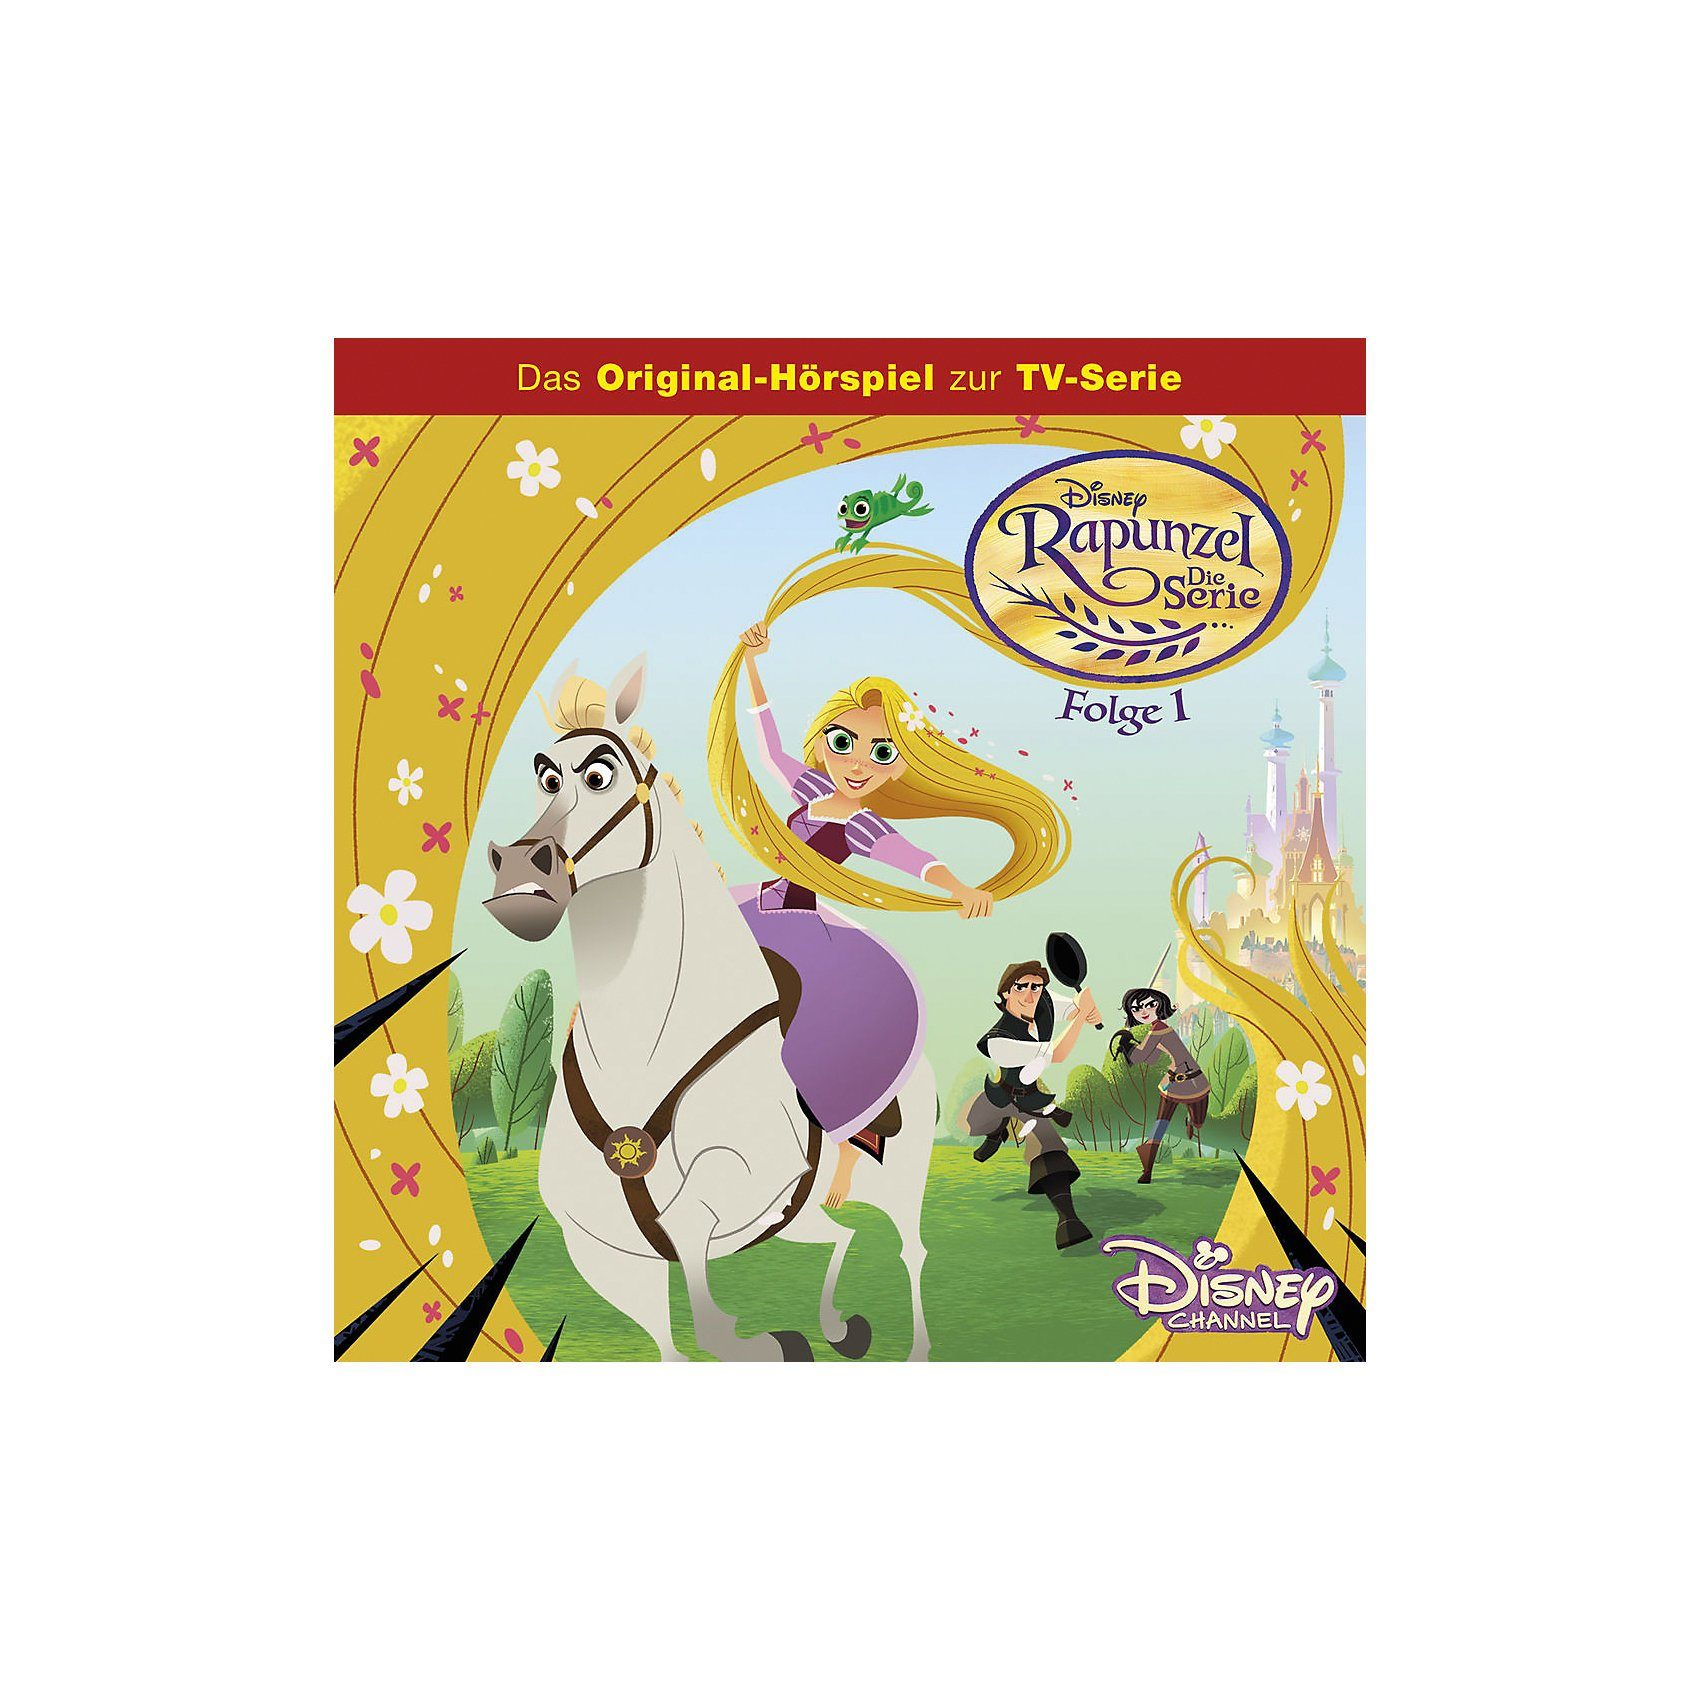 Kiddinx CD Disney Rapunzel - Folge 1